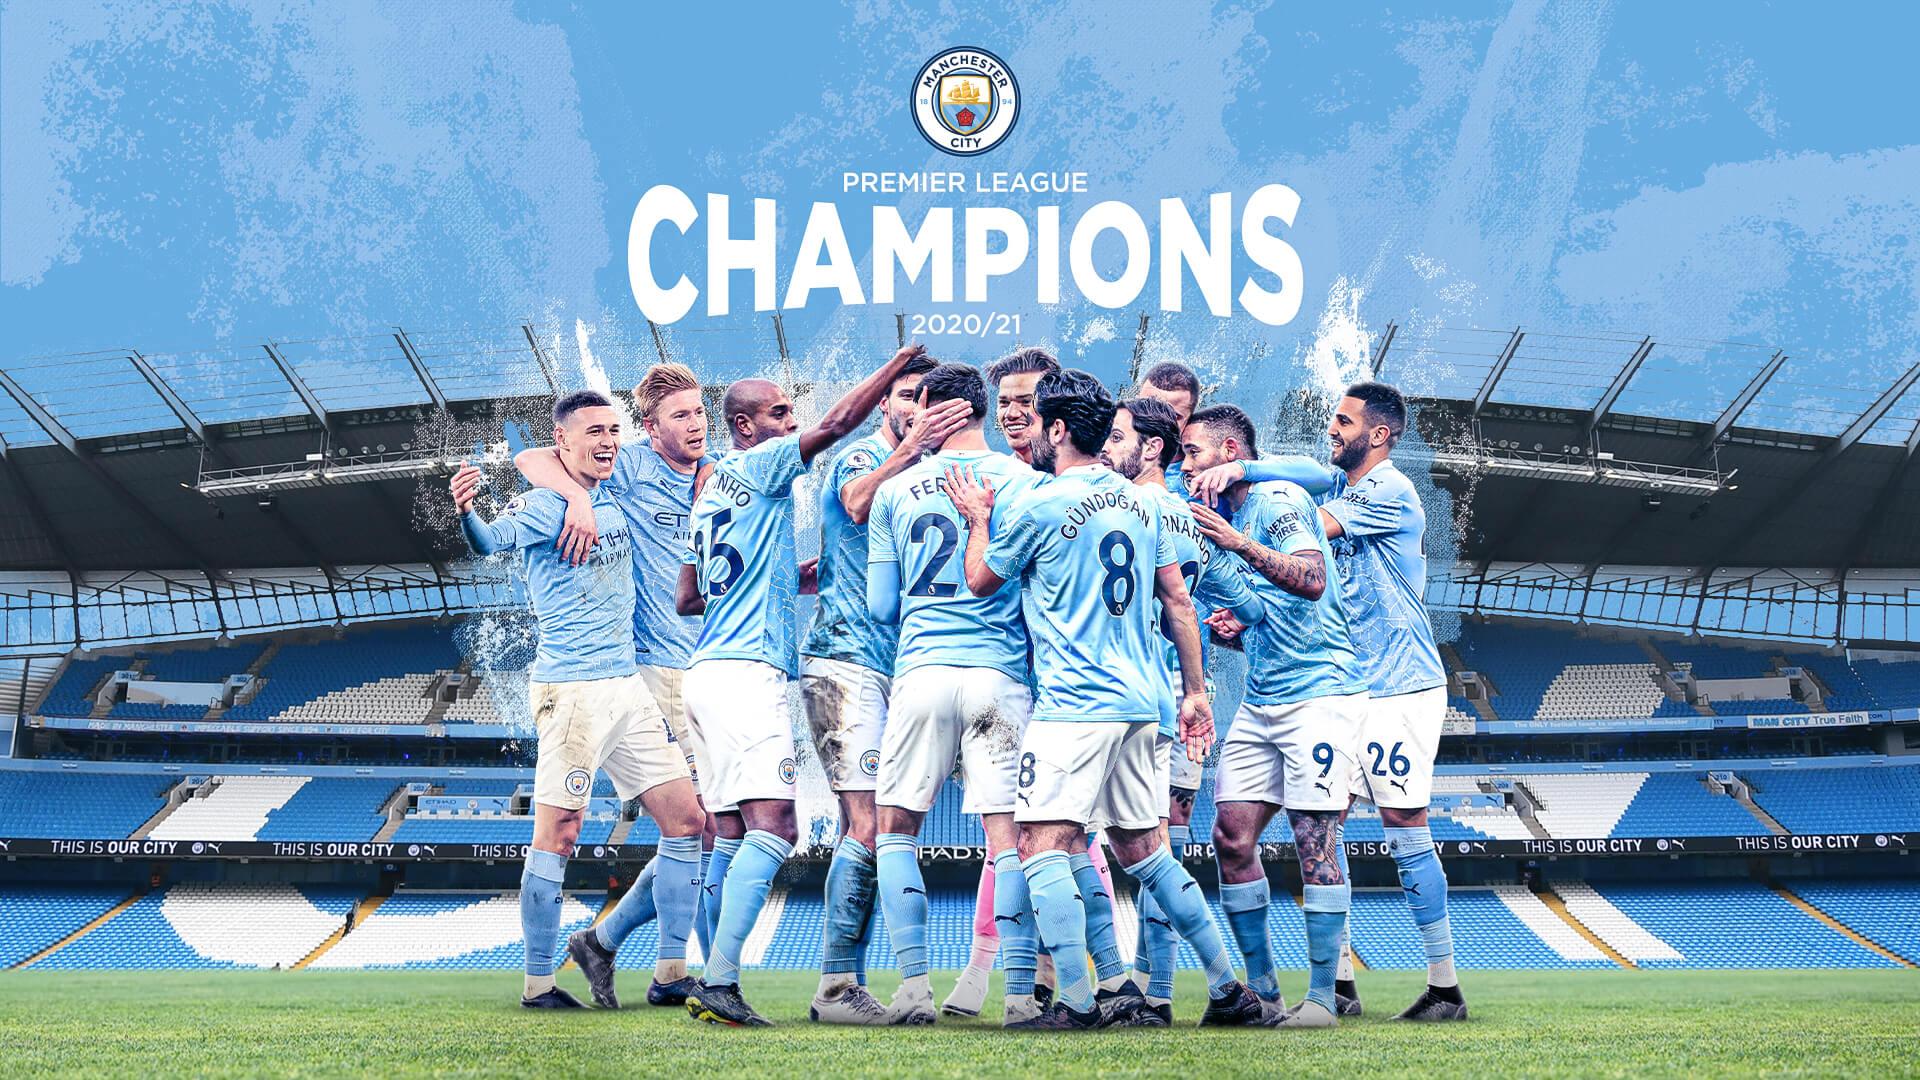 Manchester City se consagró campeón de la Premier League con la derrota del United